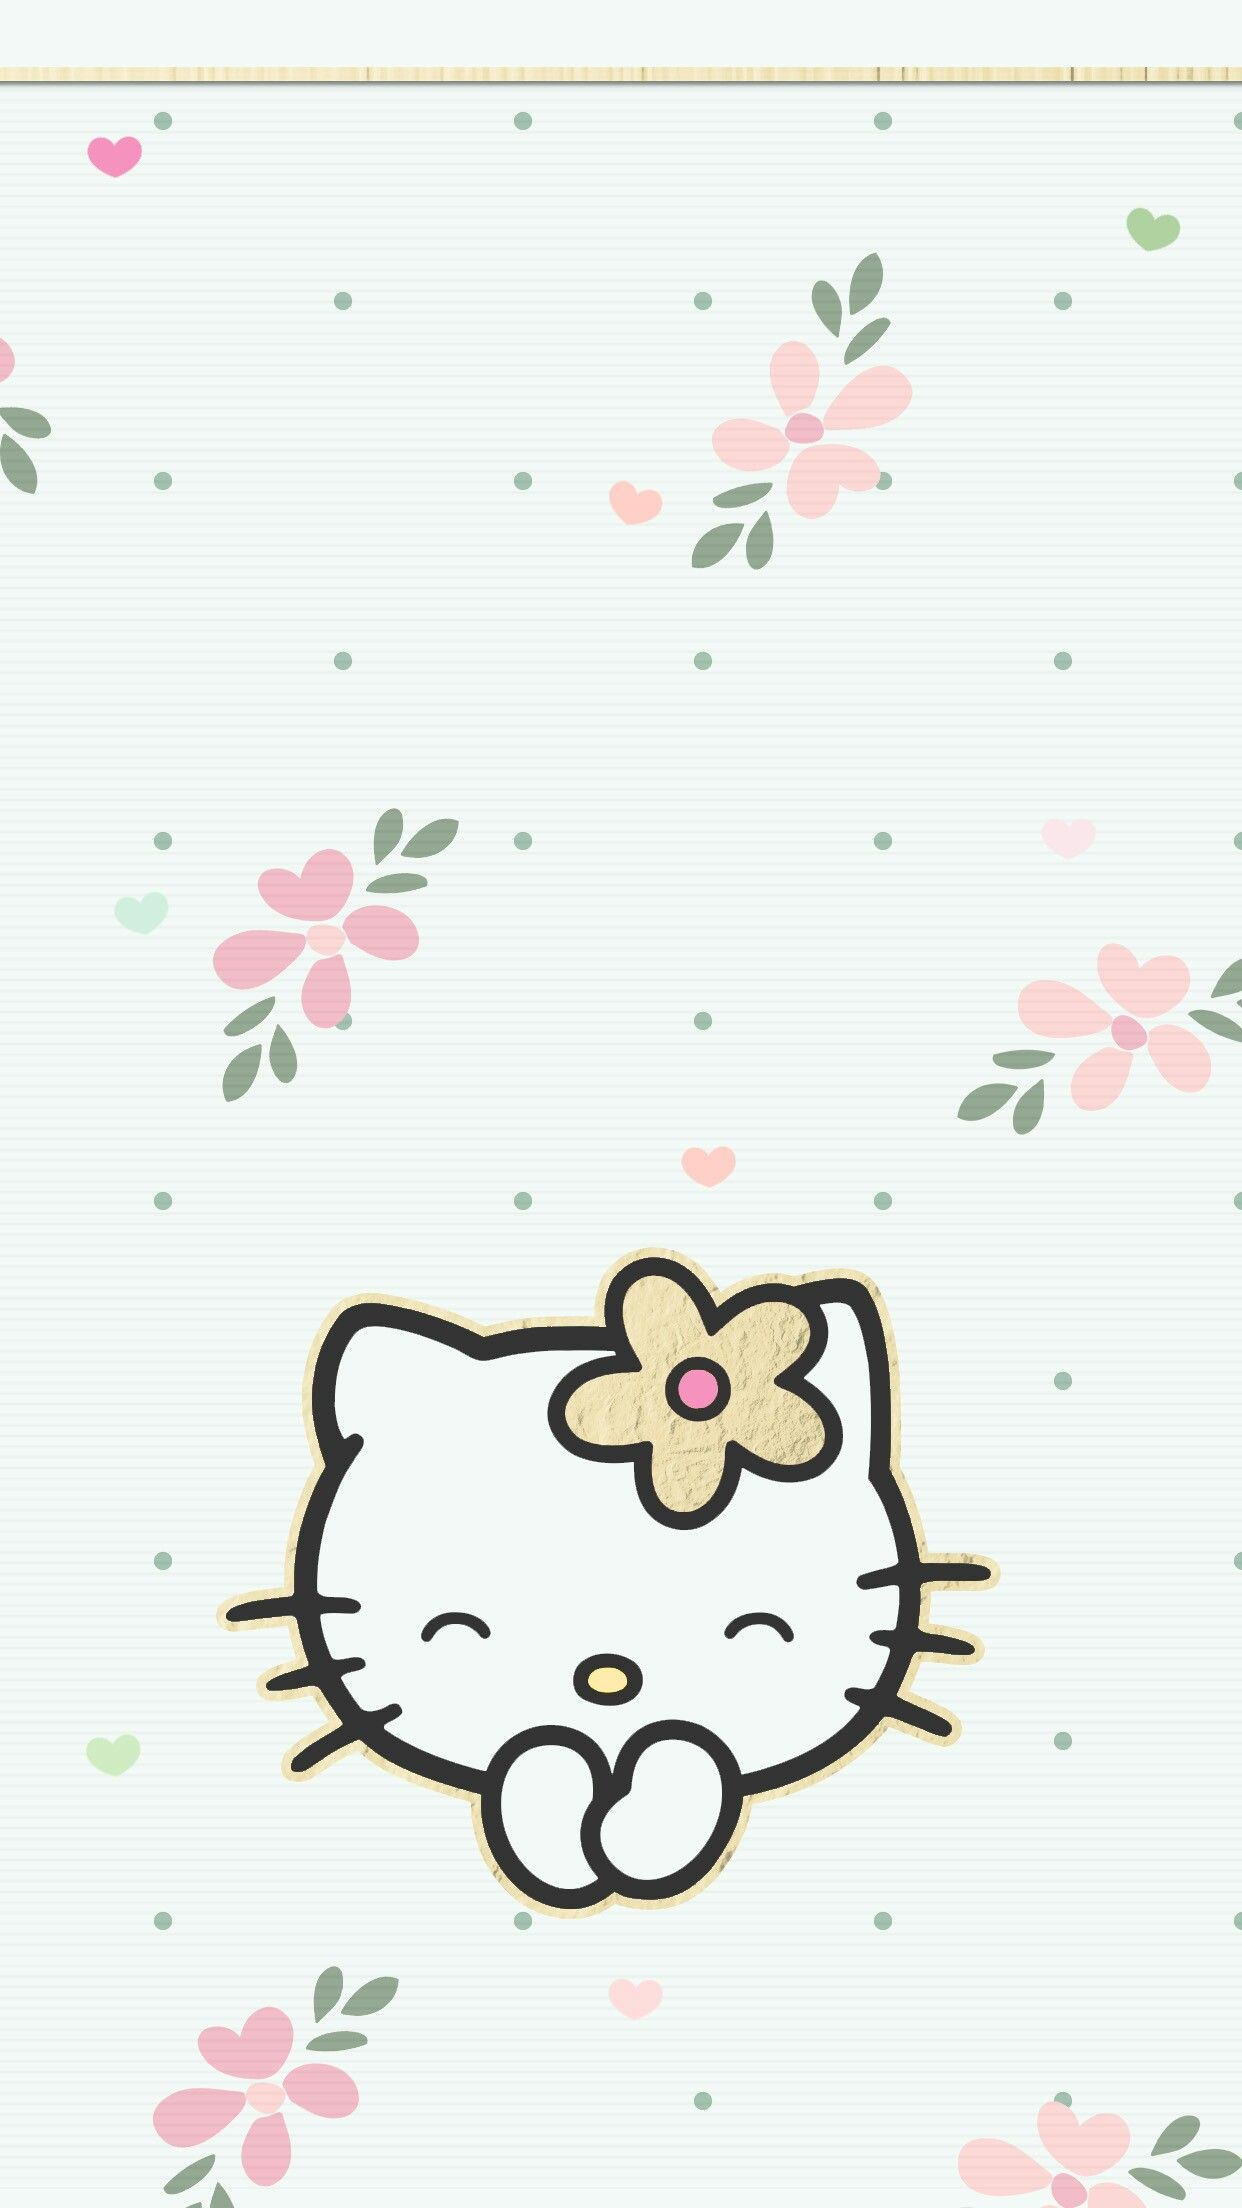 Wallpapers Walpaper Hello Kitty Amor IPhone Wall HK Tjn